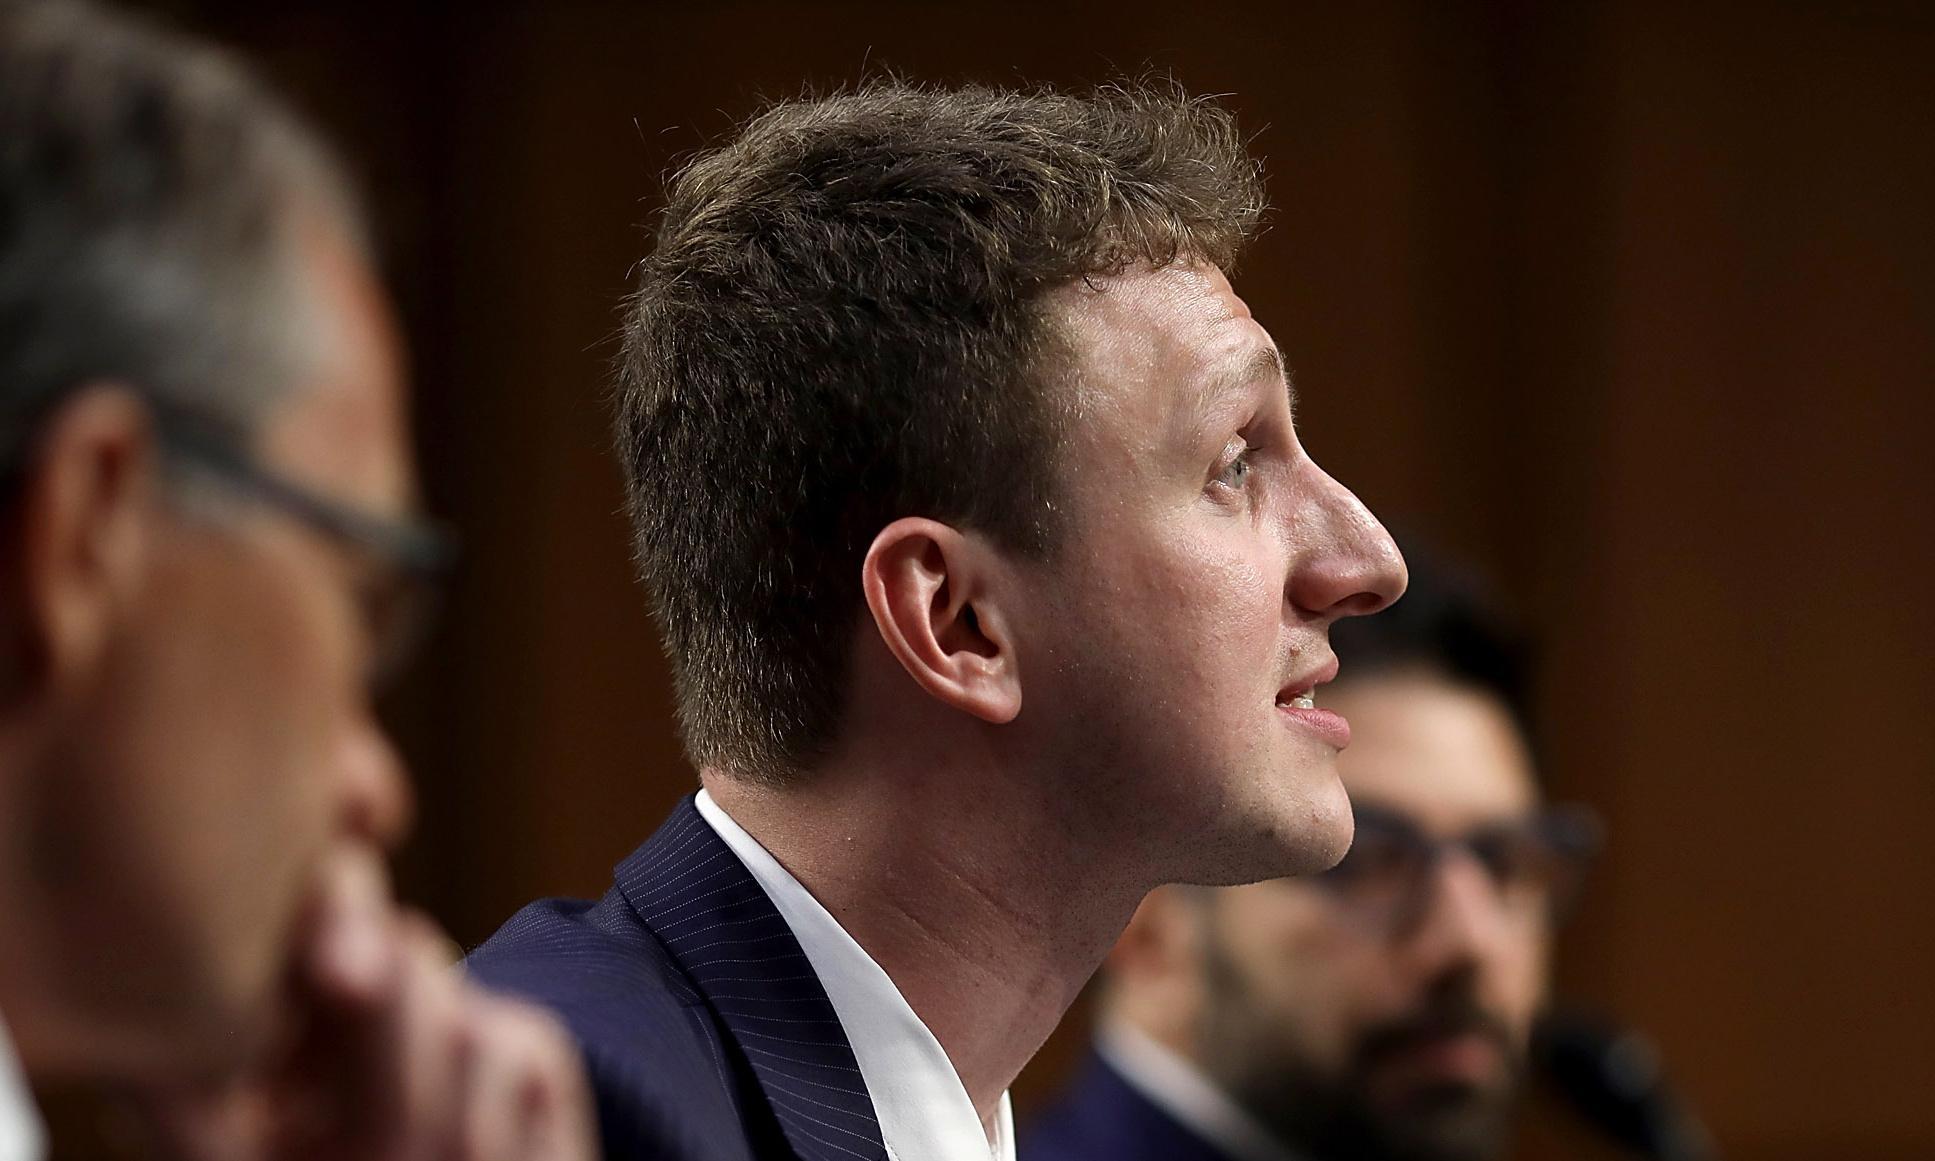 Academic at centre of Cambridge Analytica scandal sues Facebook